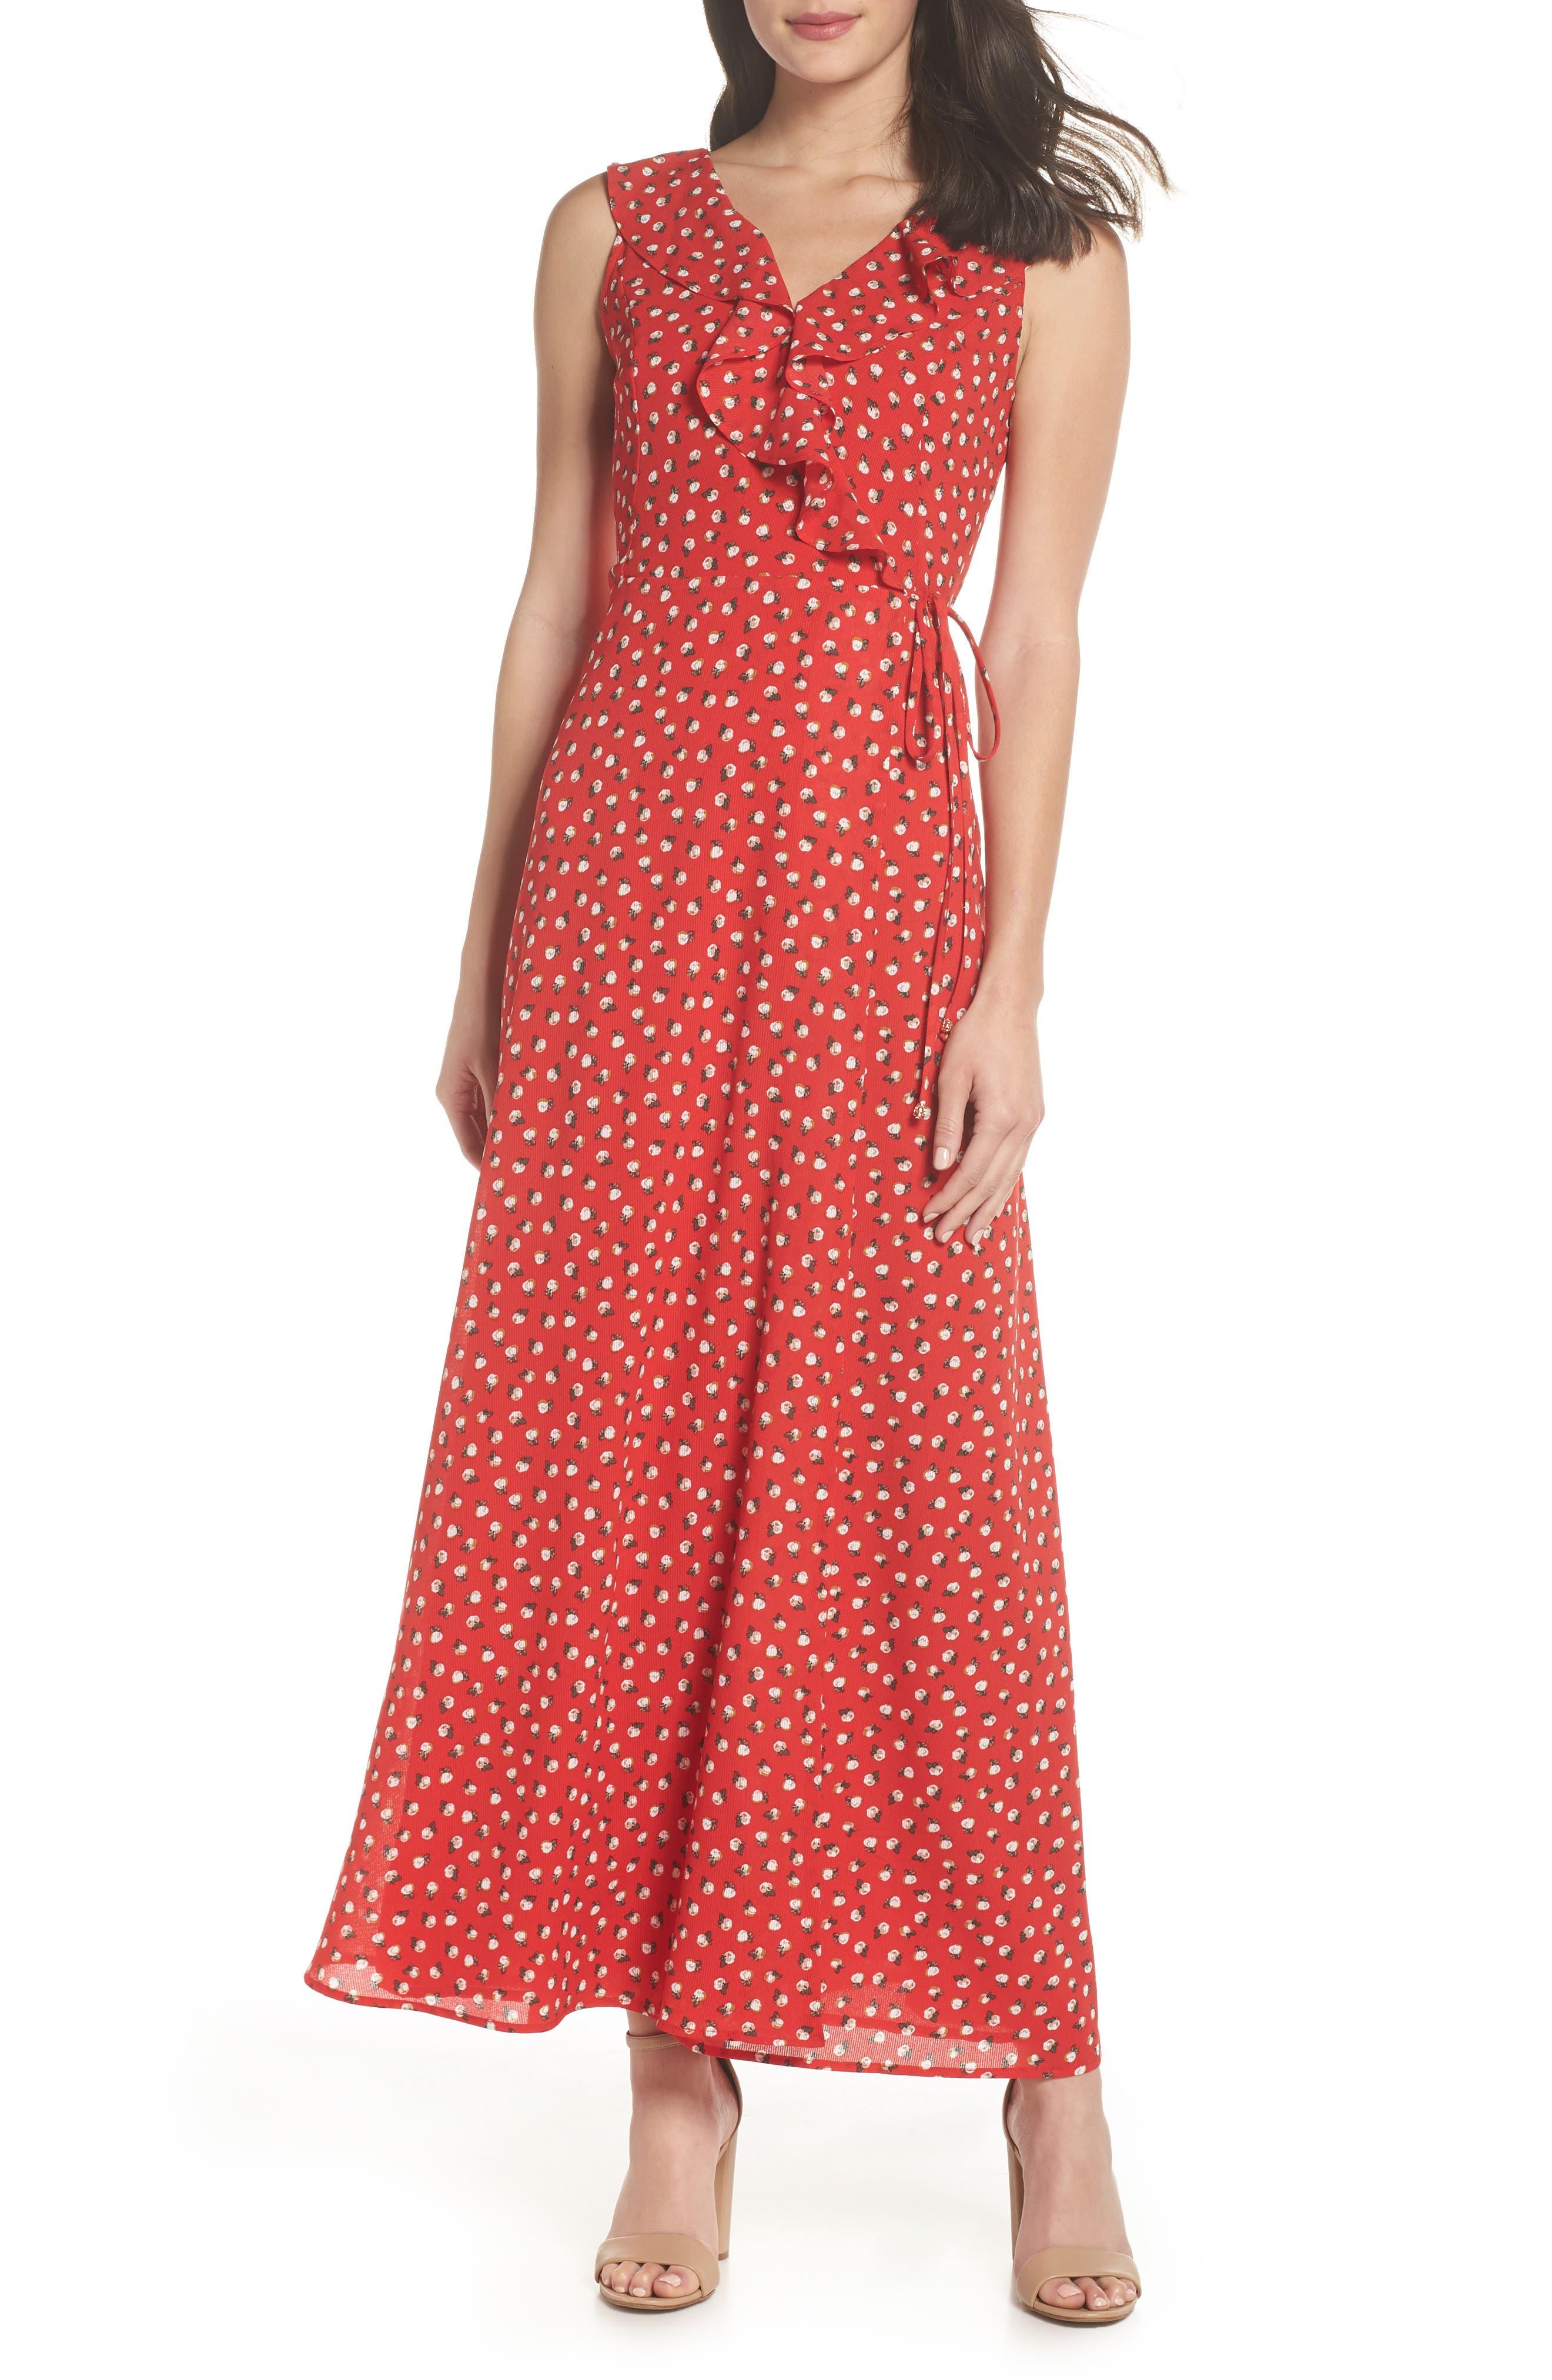 Nora Maxi Dress,                         Main,                         color, Cherry